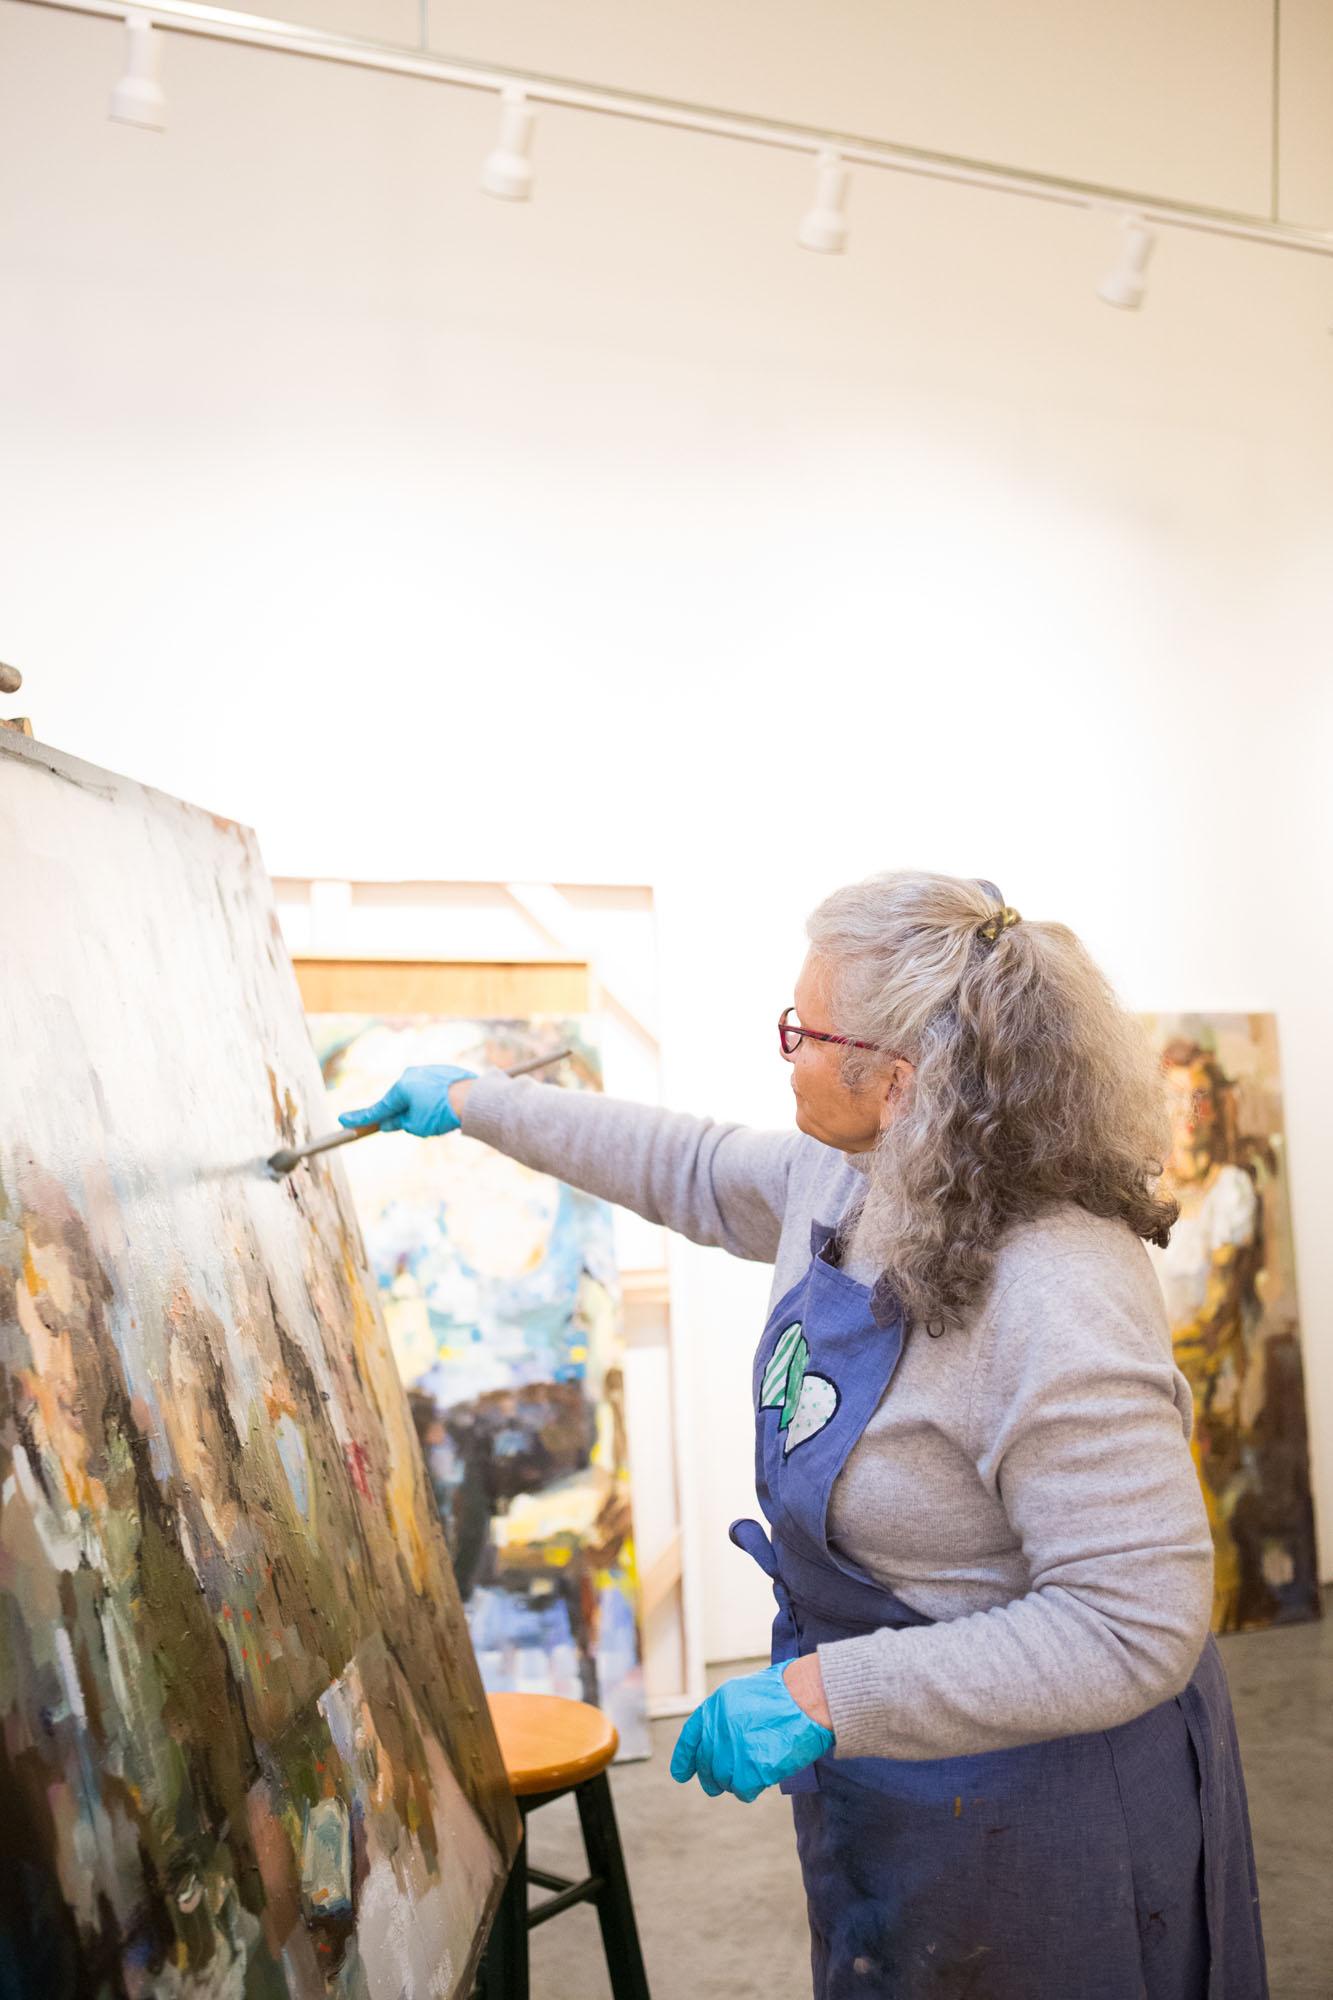 Michele-guilvazan-artist-studio-branding-photos-oil-painter98.jpg